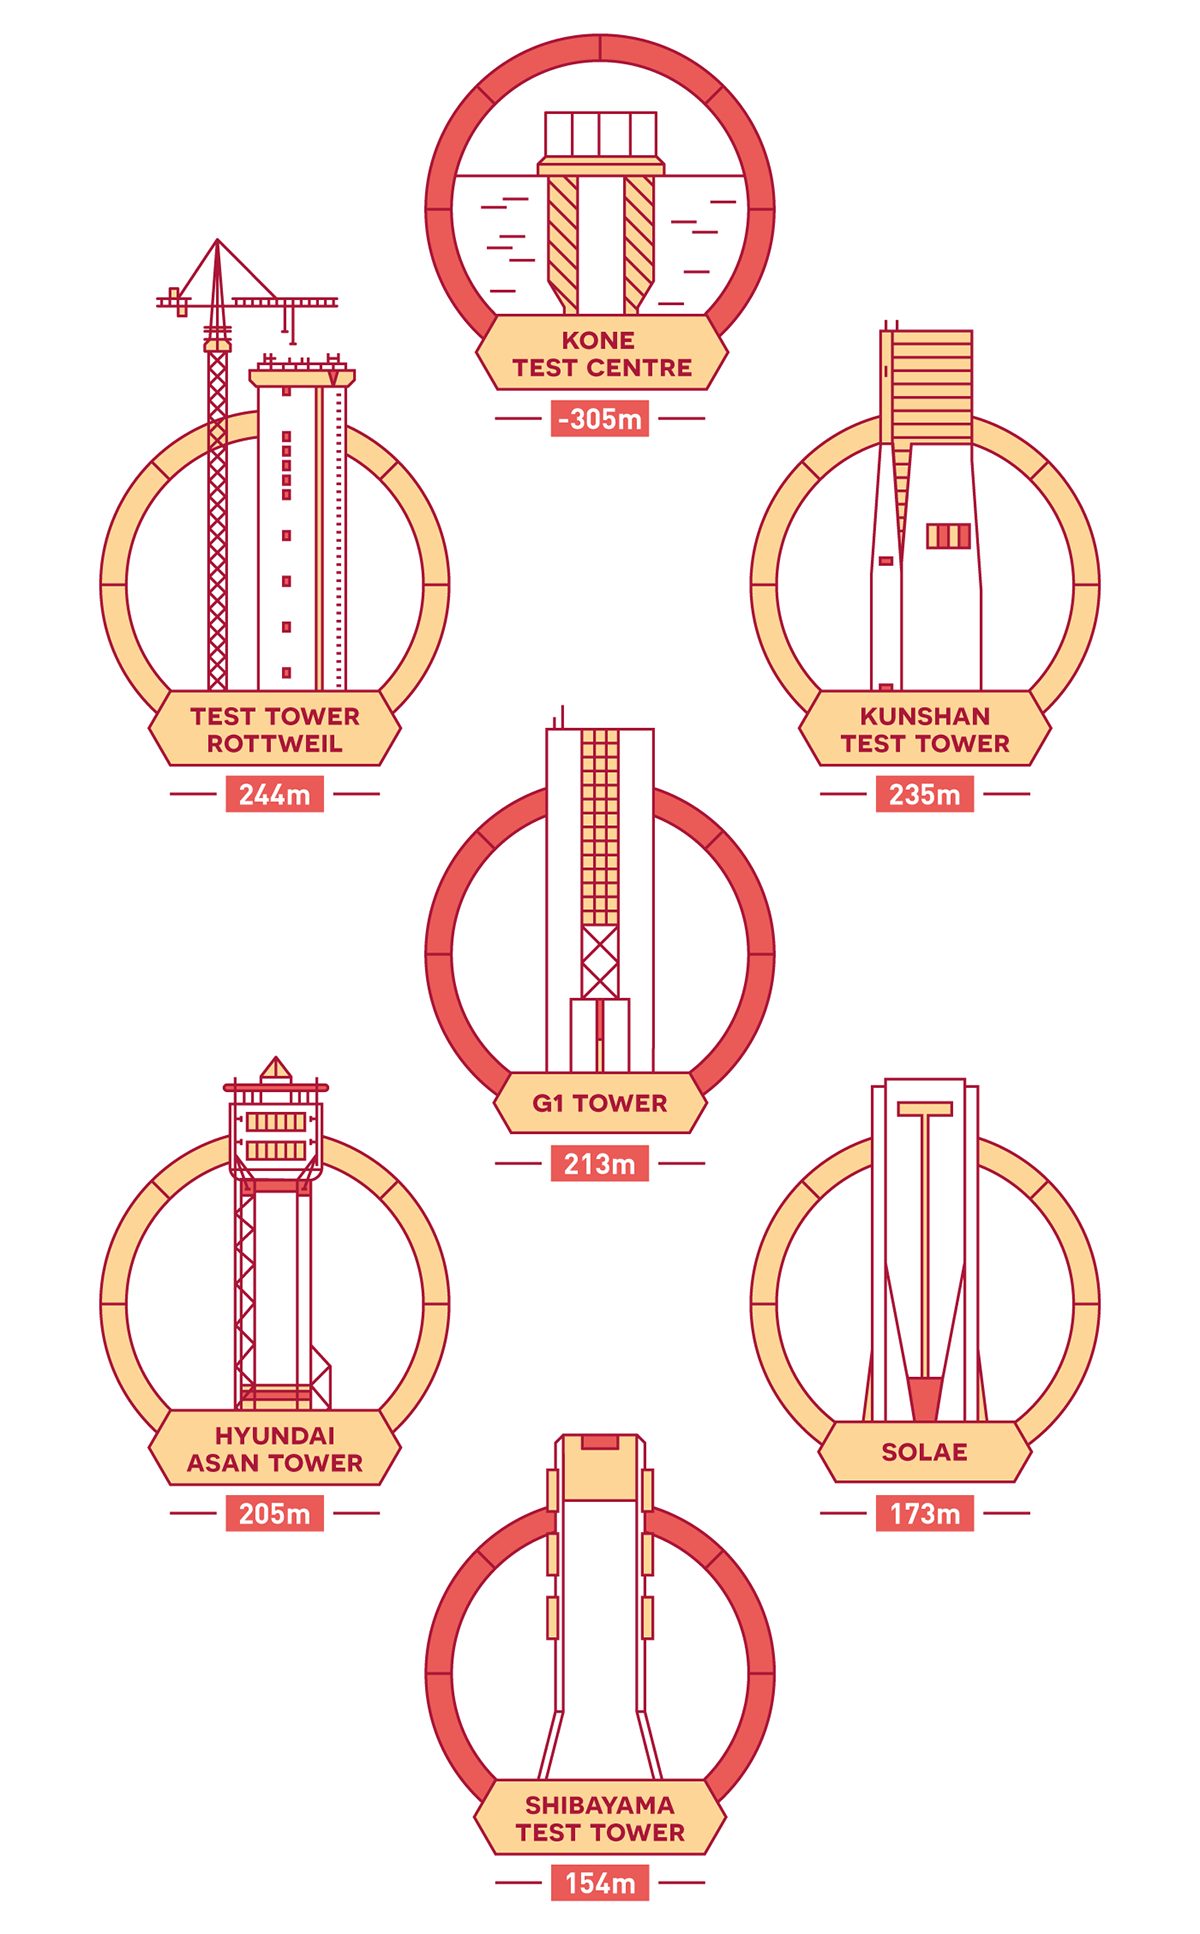 #Infografía infografia elevator Elevators ascensor ascensores edificios rascacielos infographic yorokobu